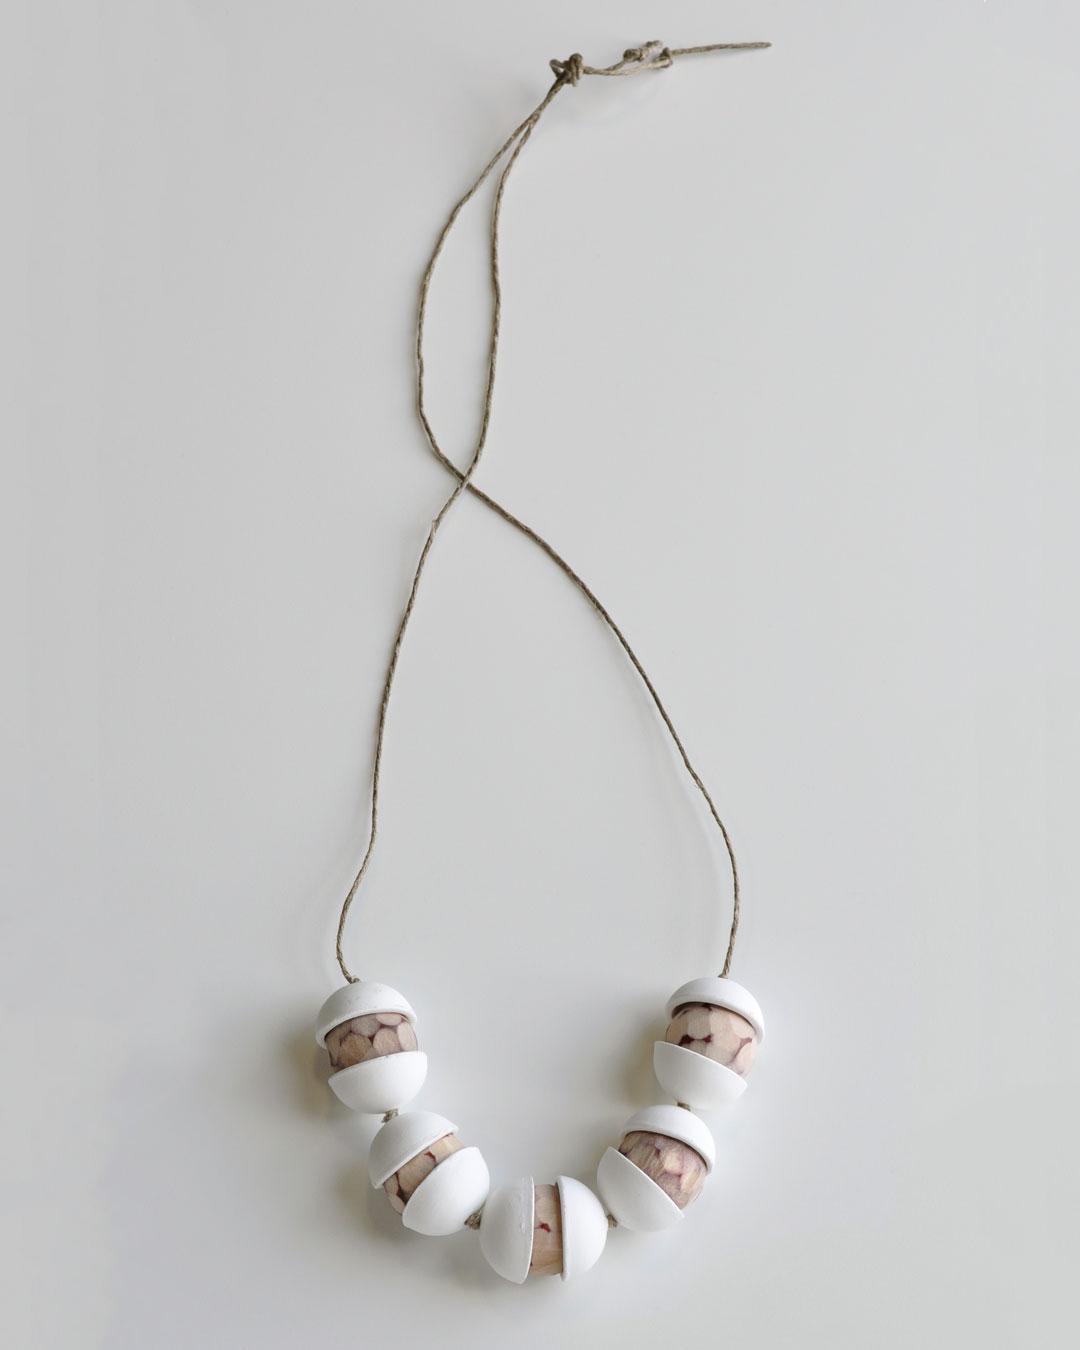 Chequita Nahar, Alla Kondre, 2010, necklace; porcelain, pine, string, 408 x 142 x 30 mm, €640